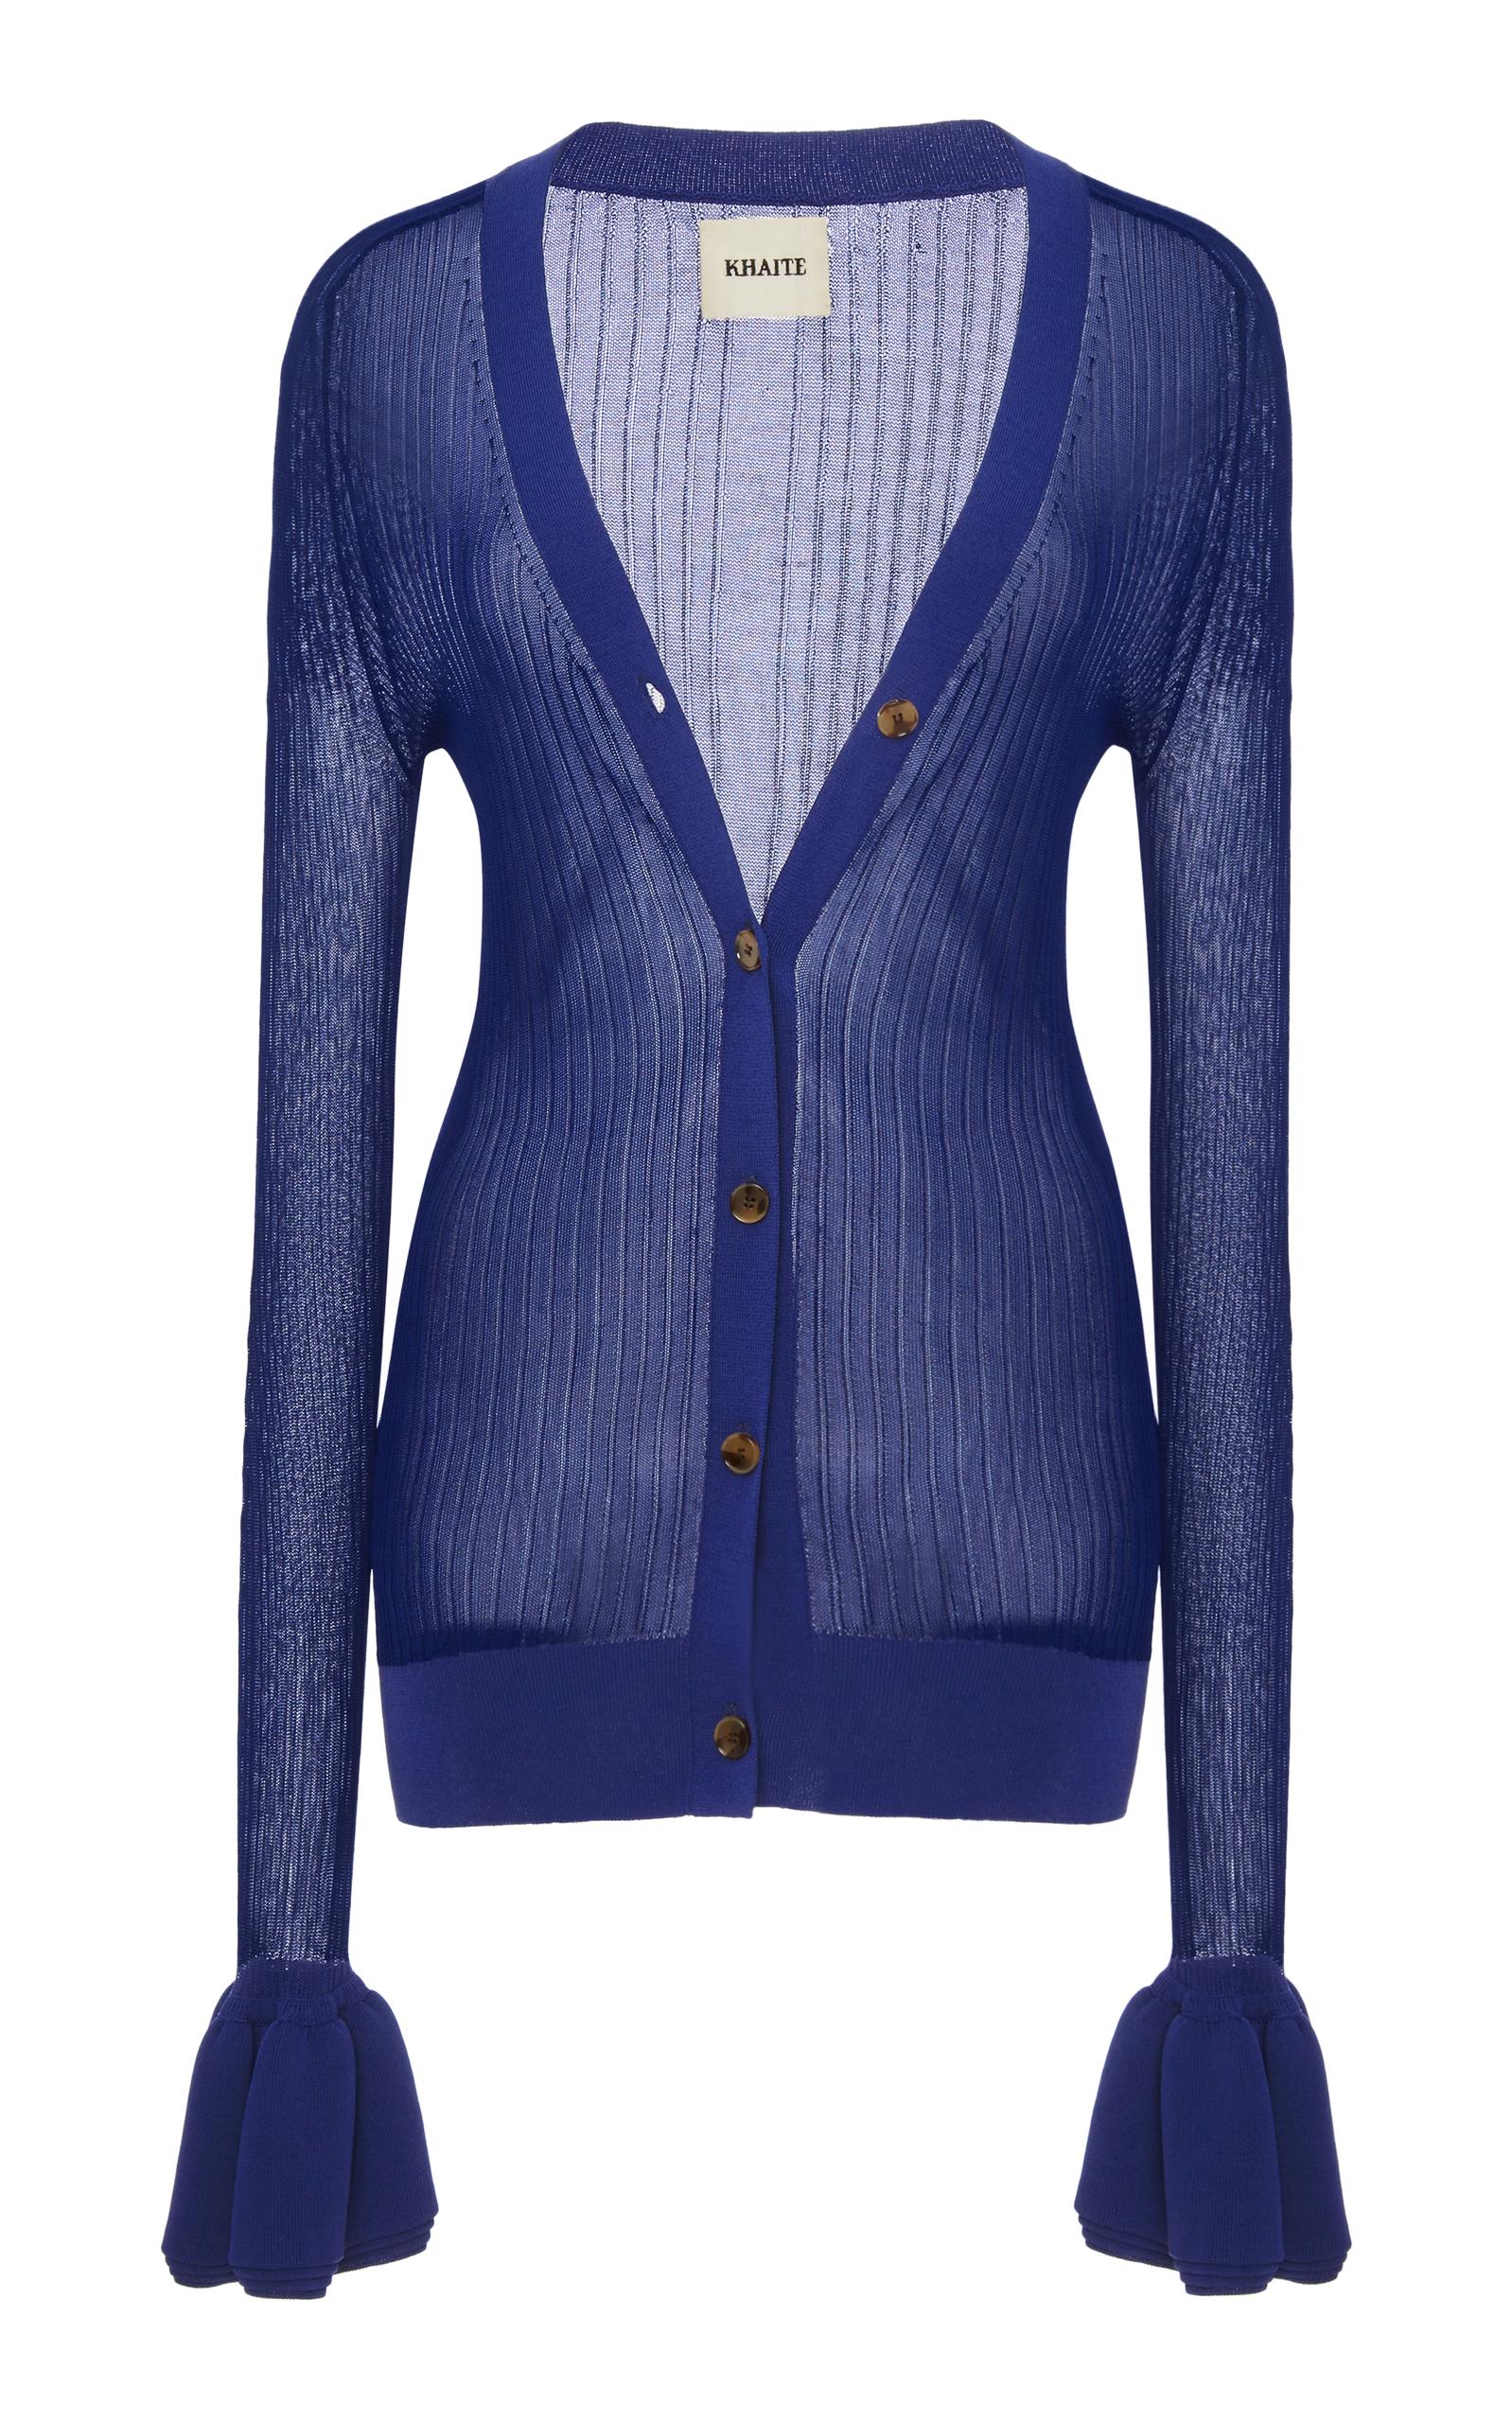 Eloise Sheer Cardigan by Khaite | Moda Operandi